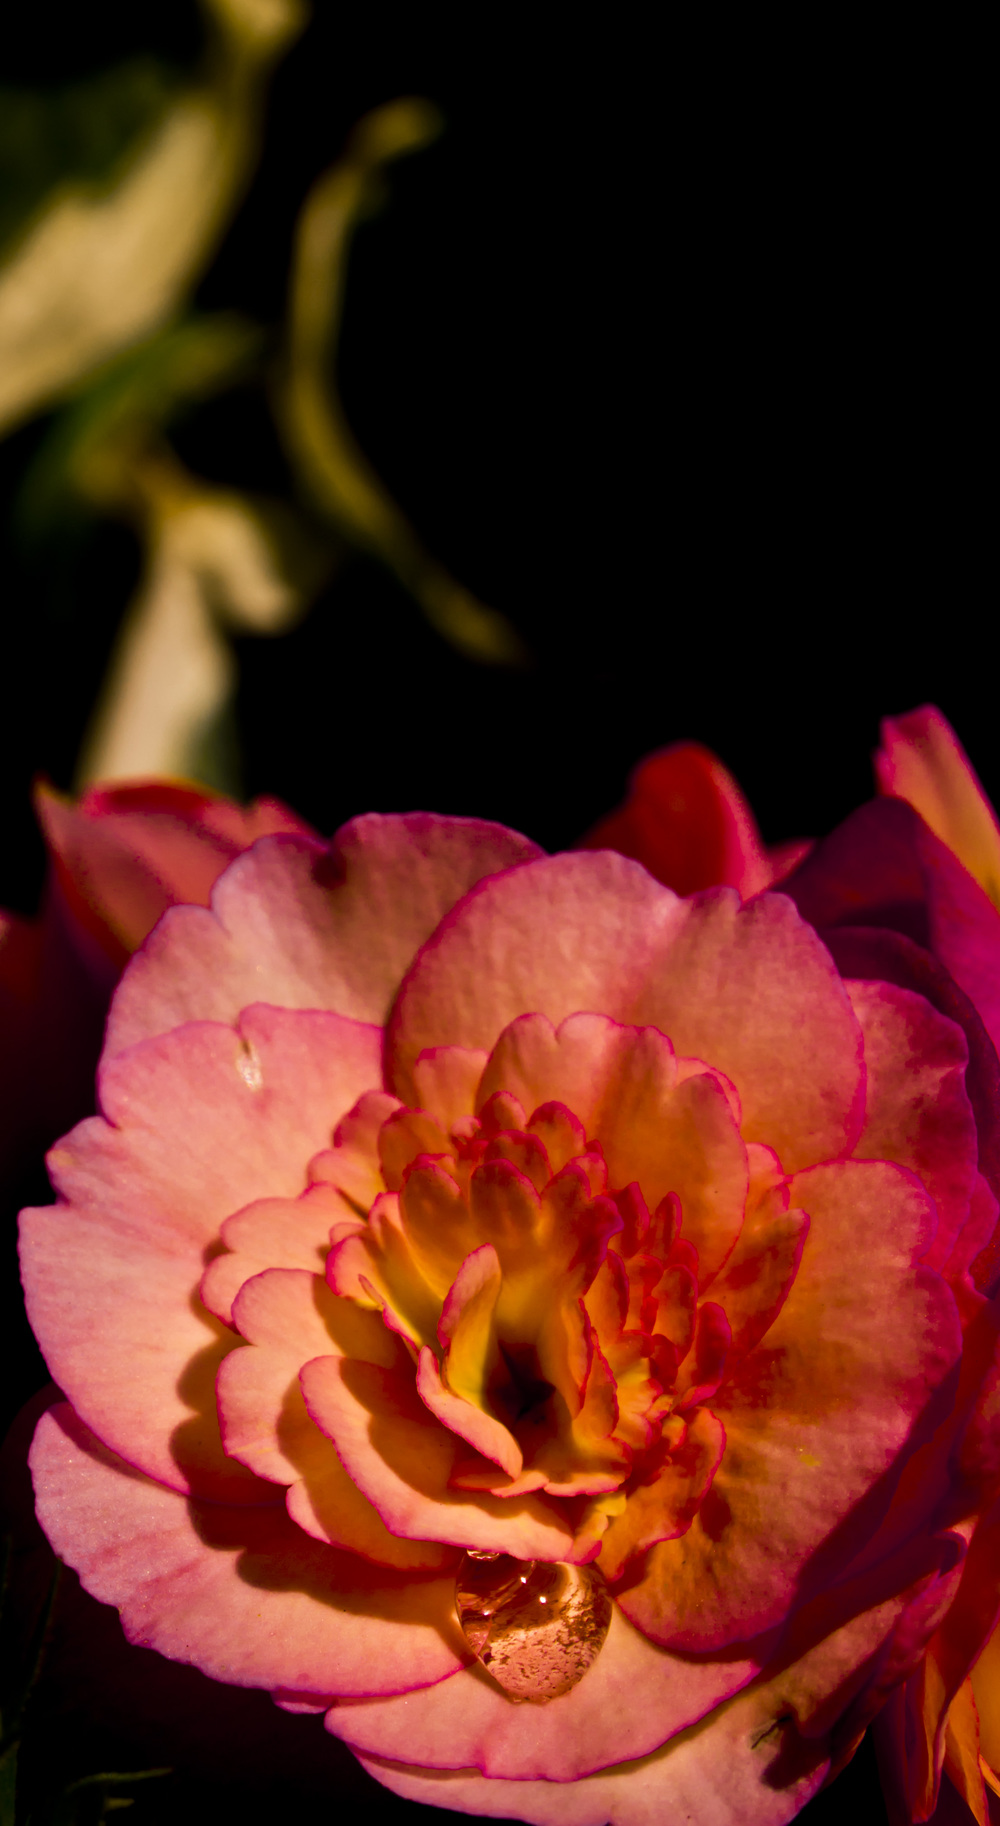 Flower and Water Droplet.jpg